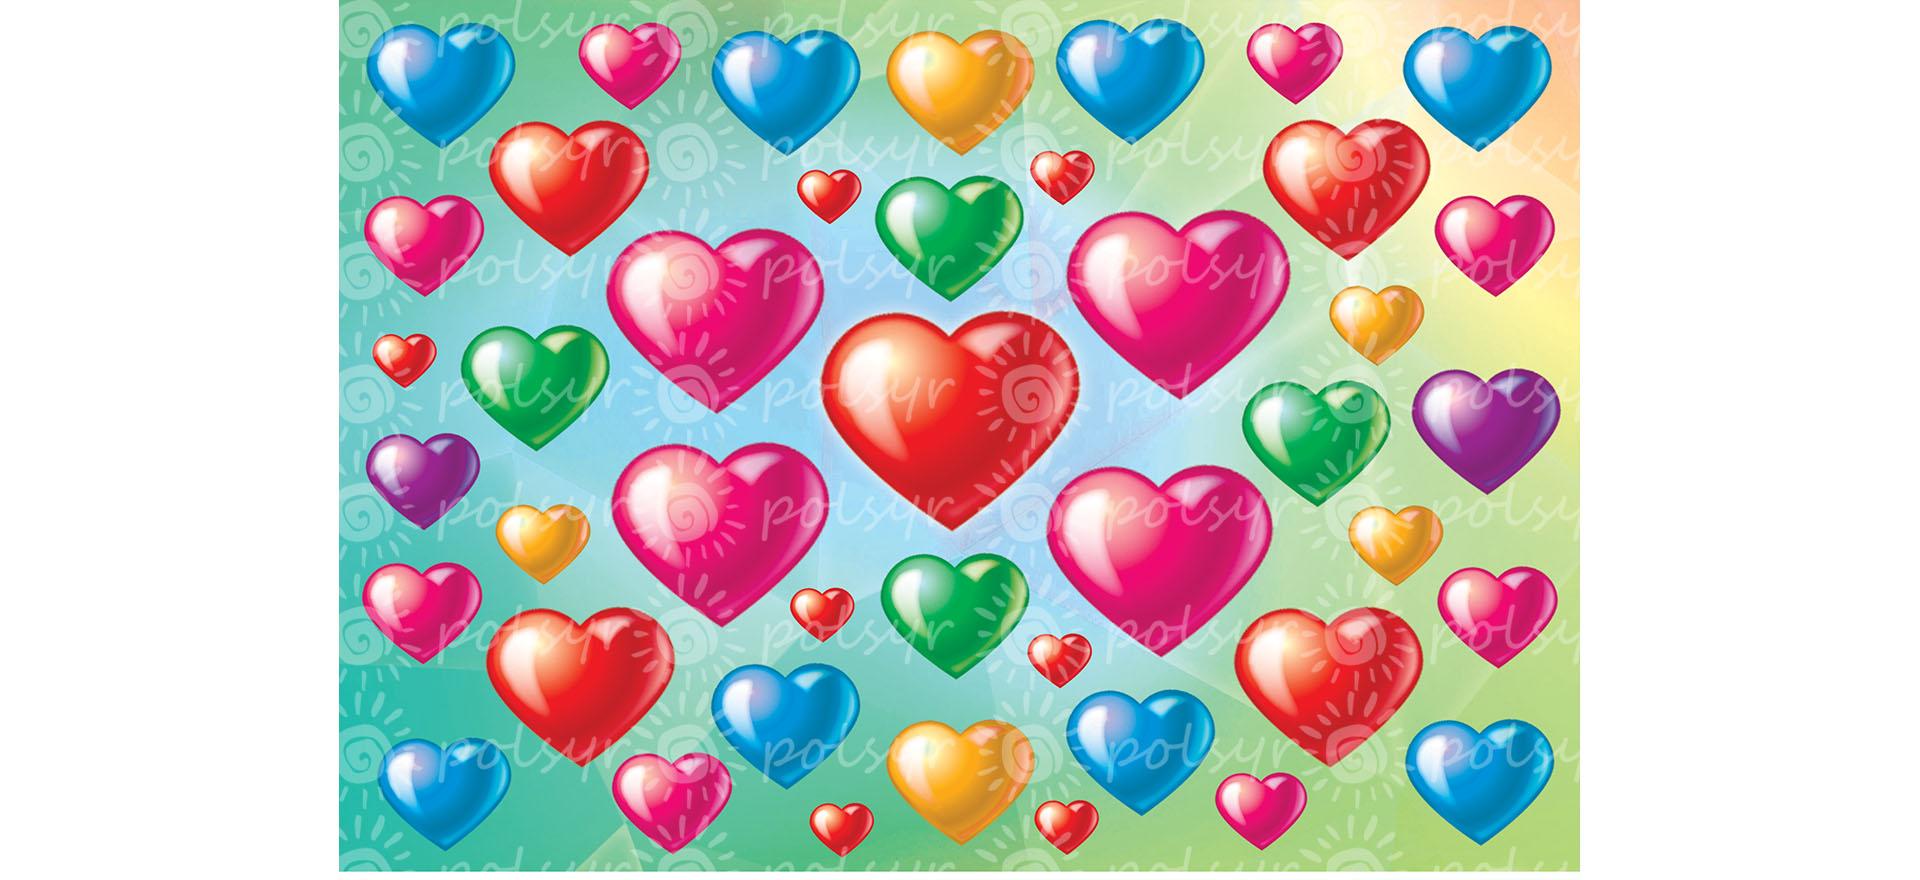 naklejki-serca-duze-polsyr-5